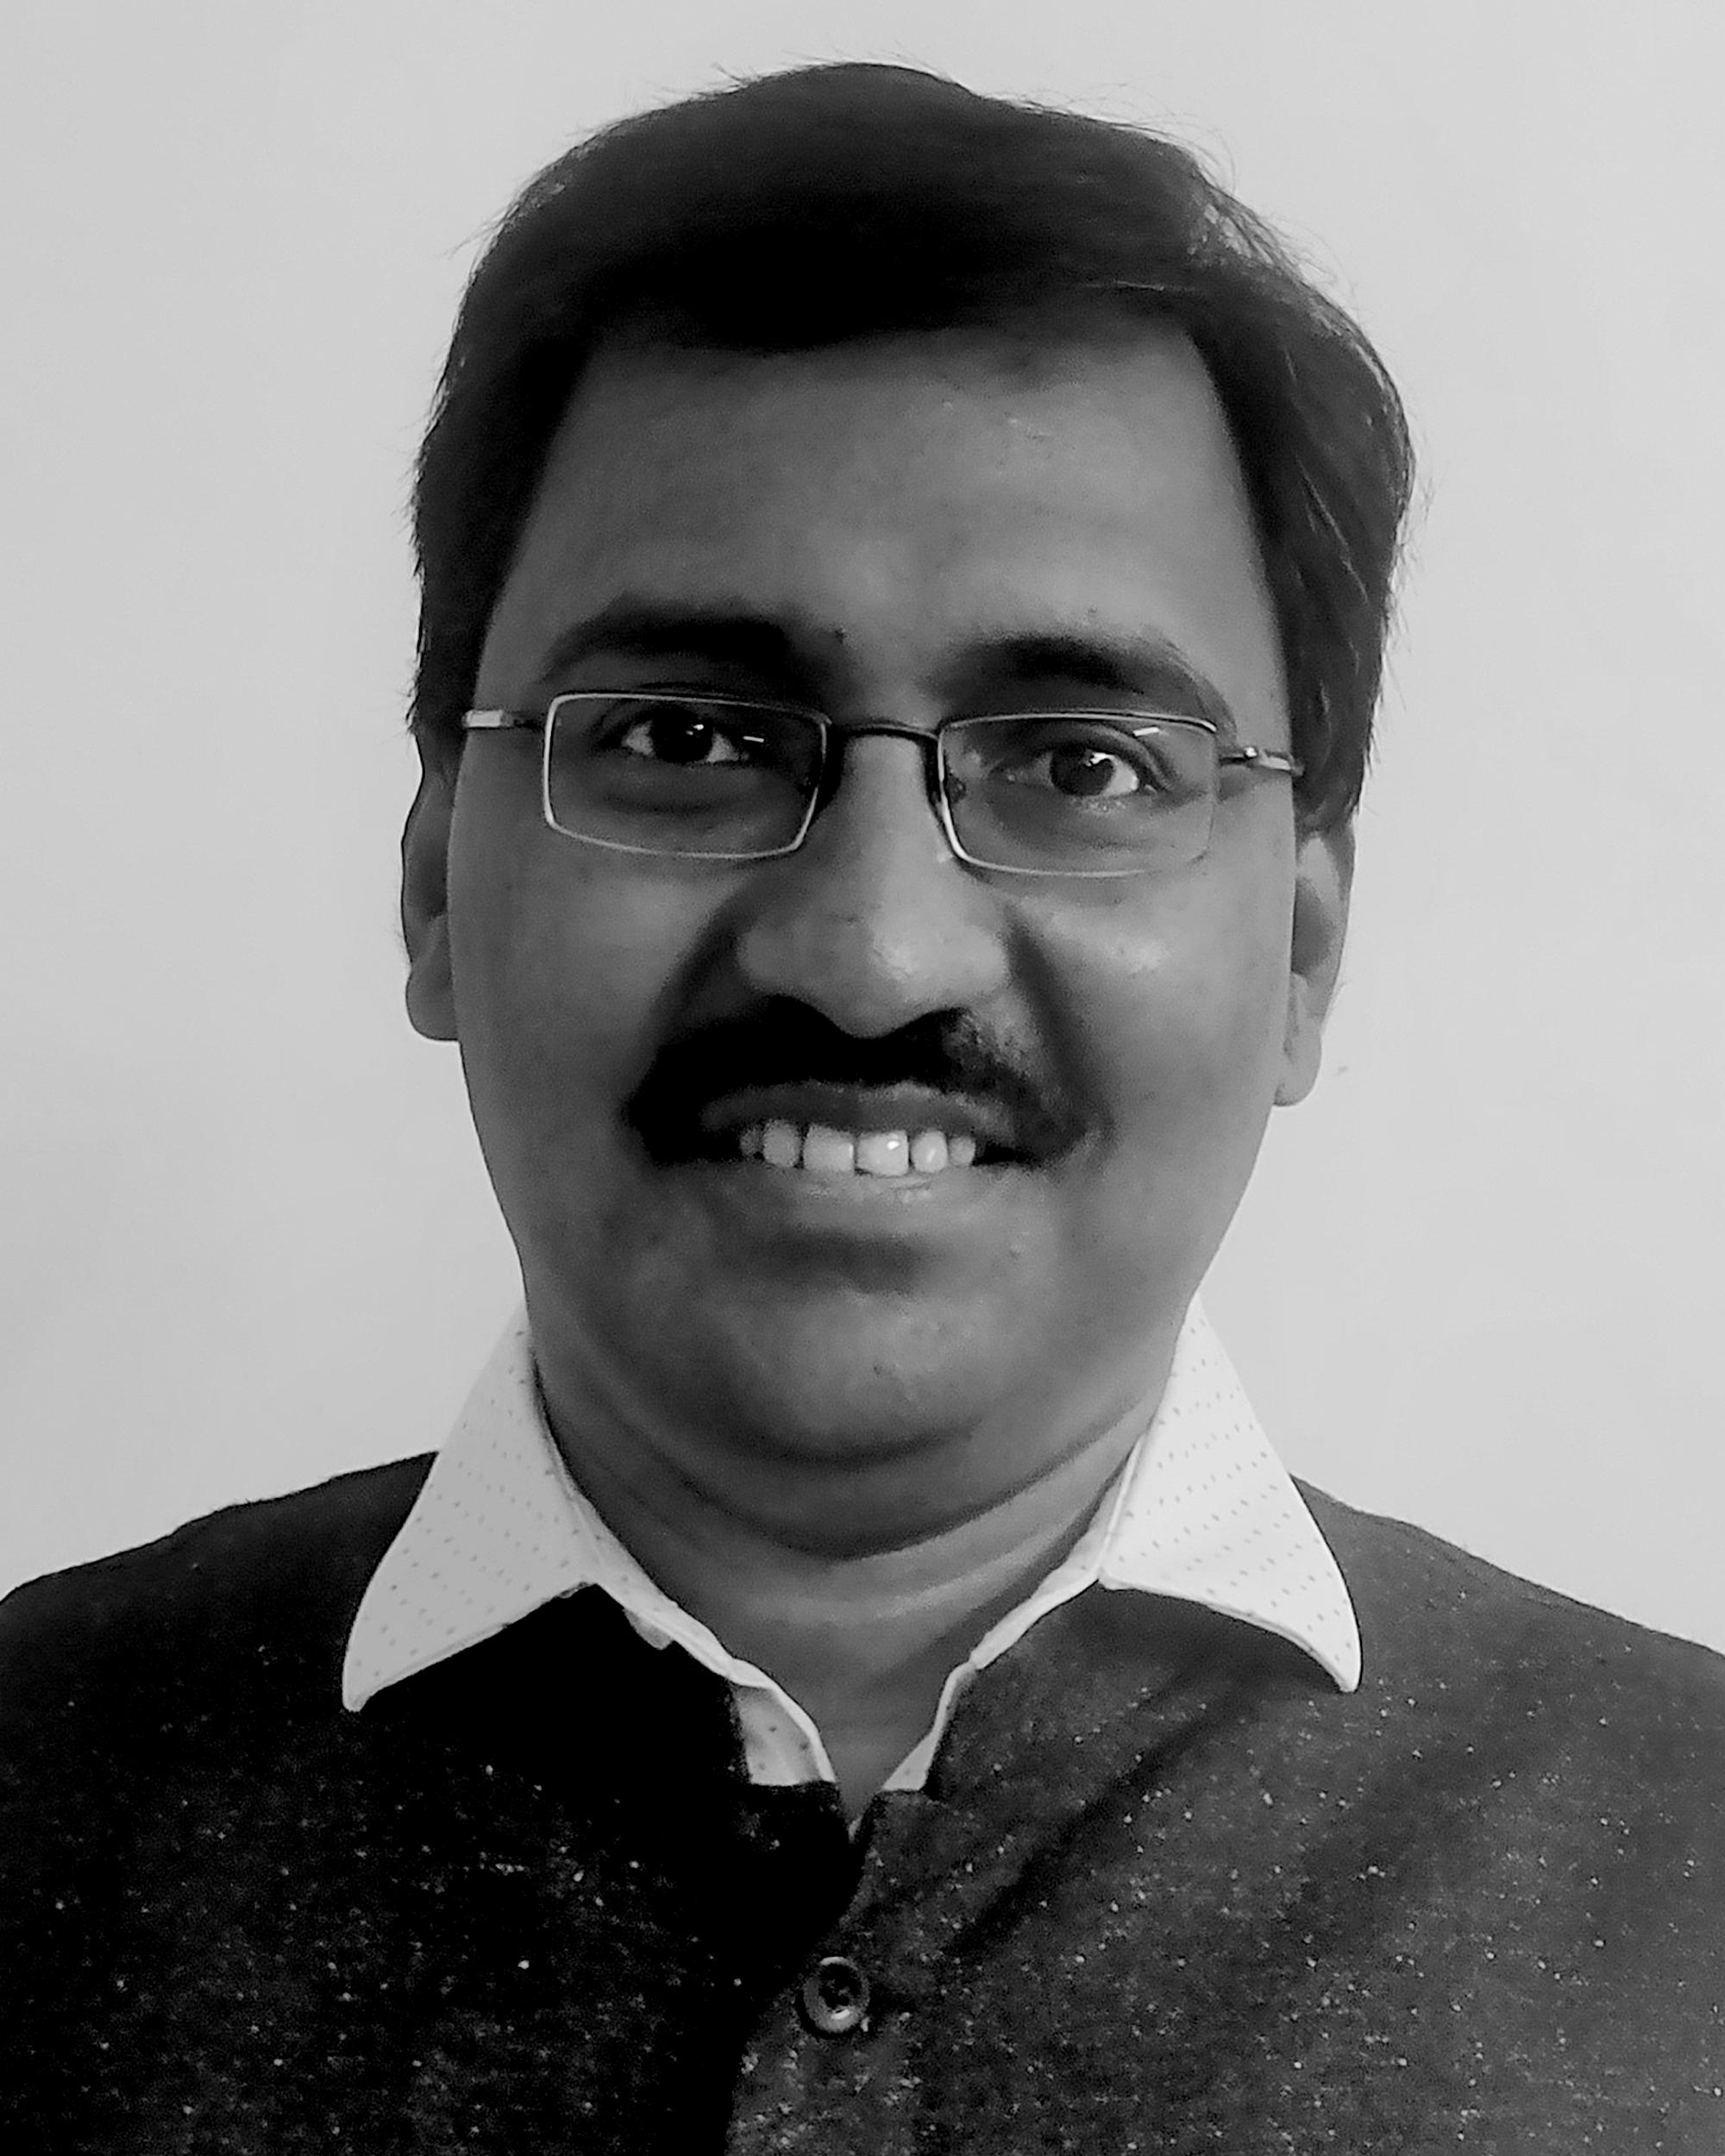 Headshot of Ramakrishna Paduchuri